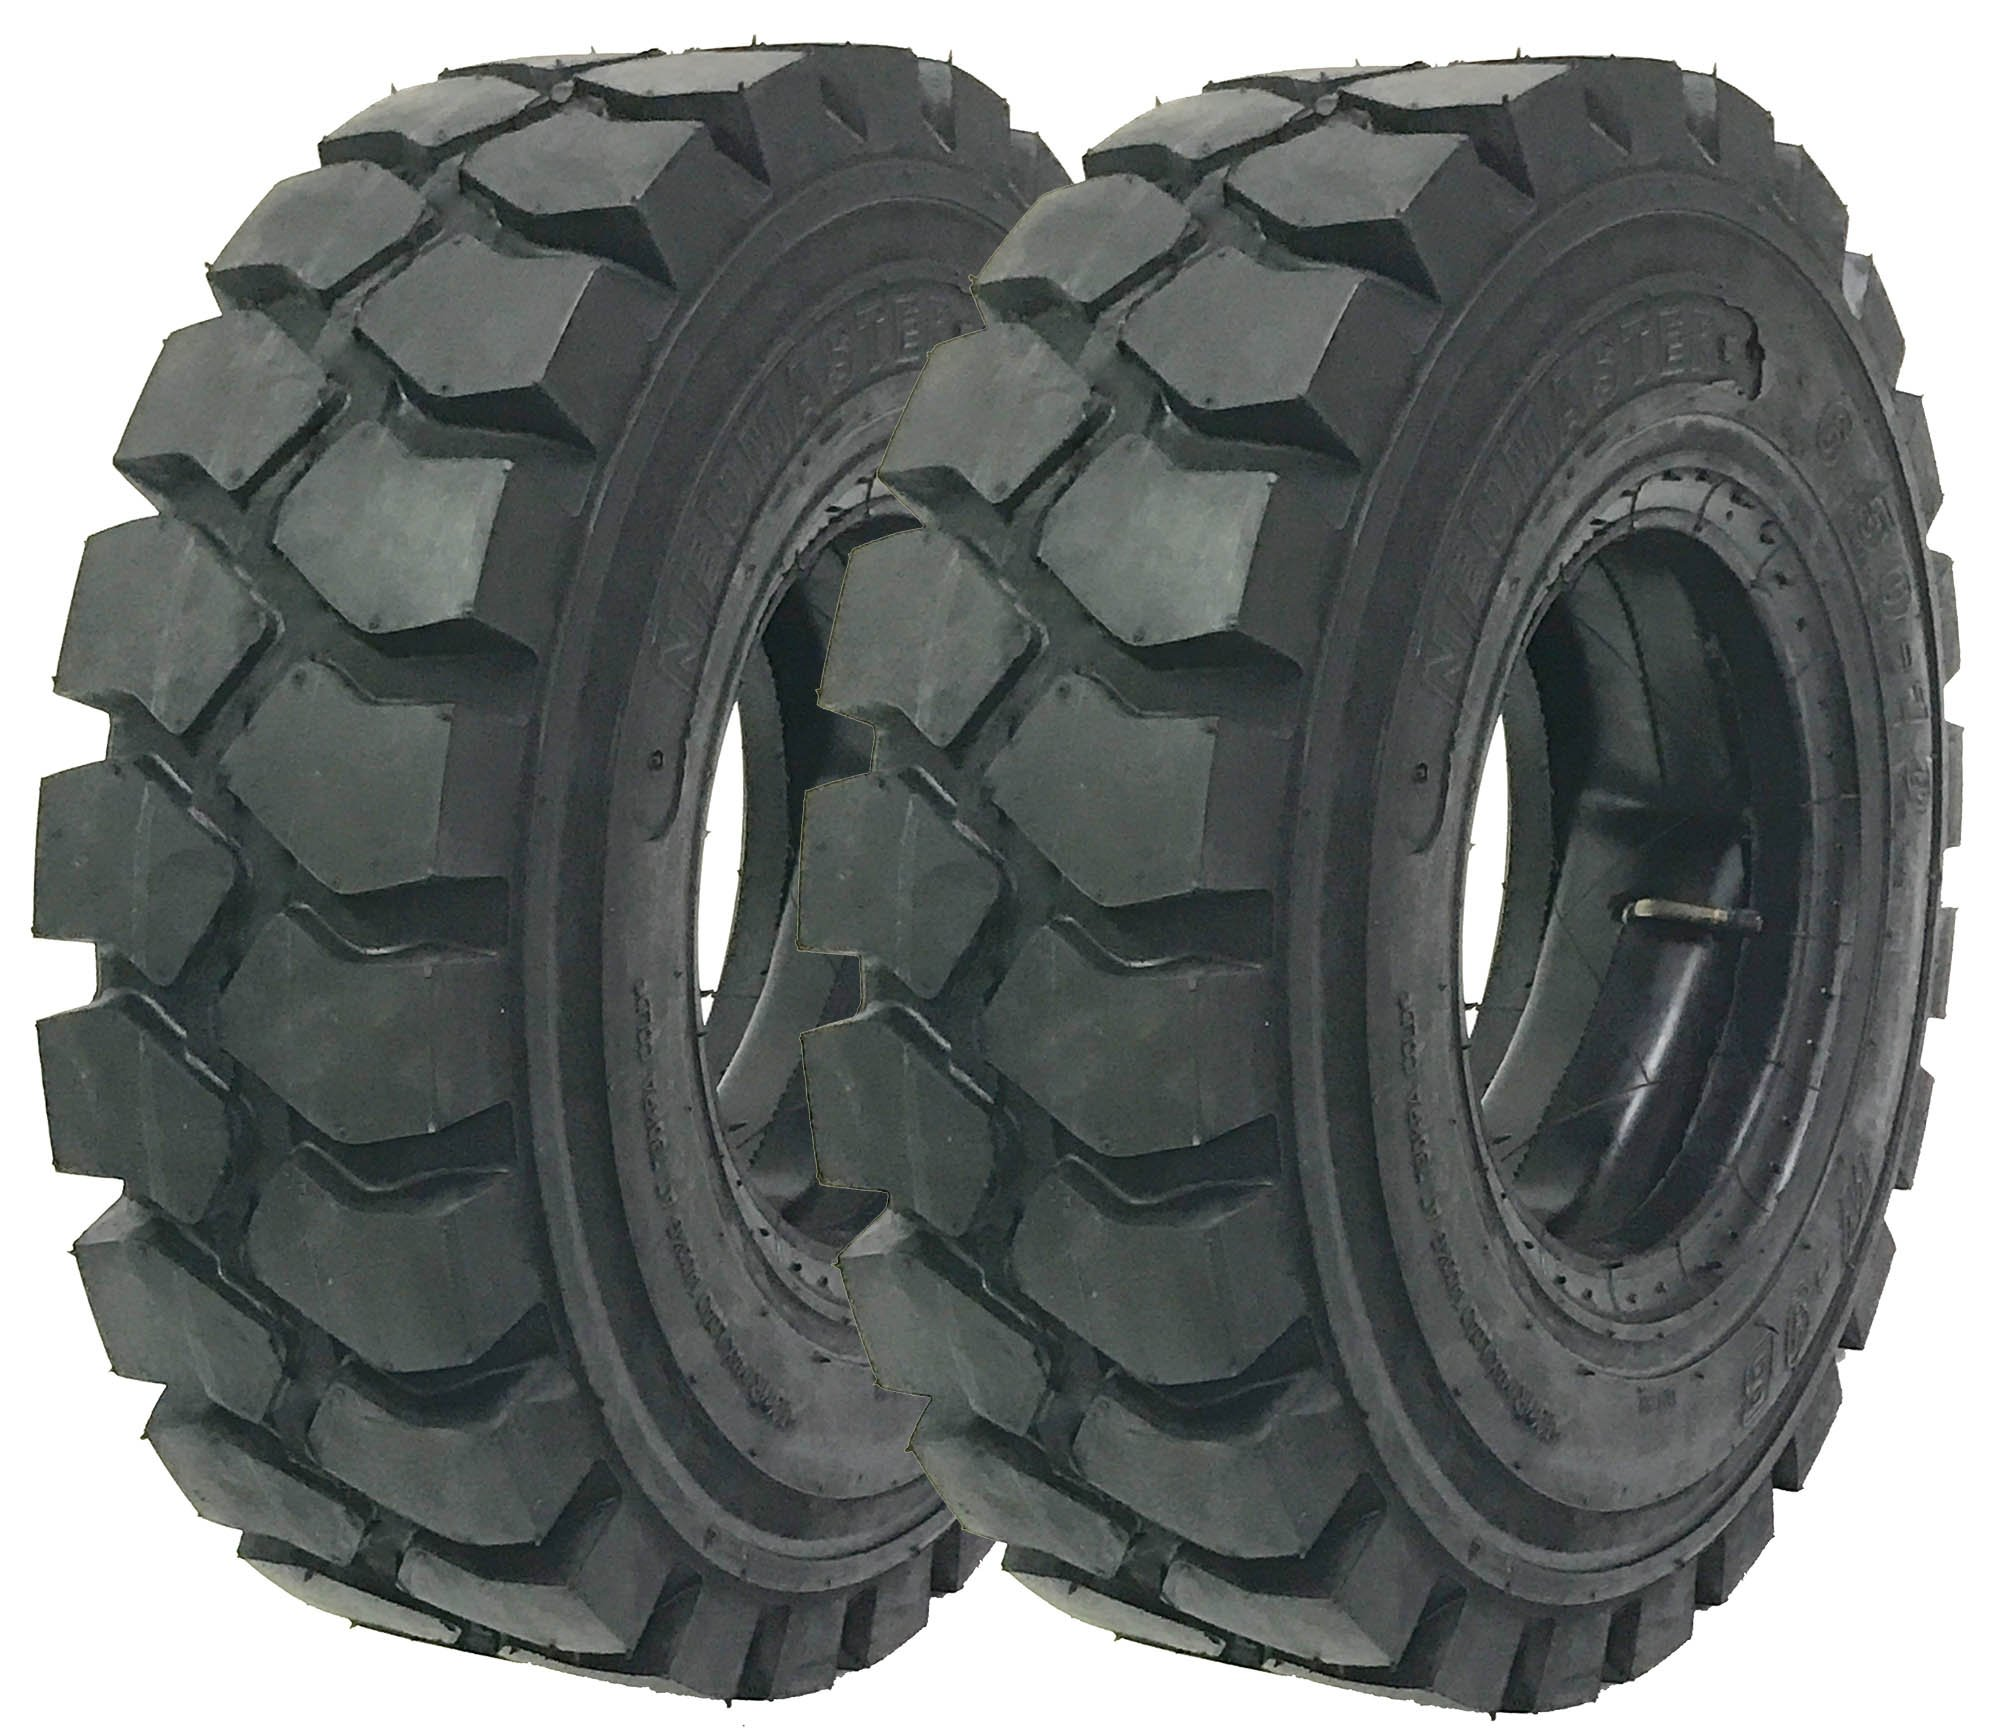 2 New Zeemax Heavy Duty 5.00-8 /10TT Forklift Tires w/Tube & Flap Rim Guard by ZEEMAX